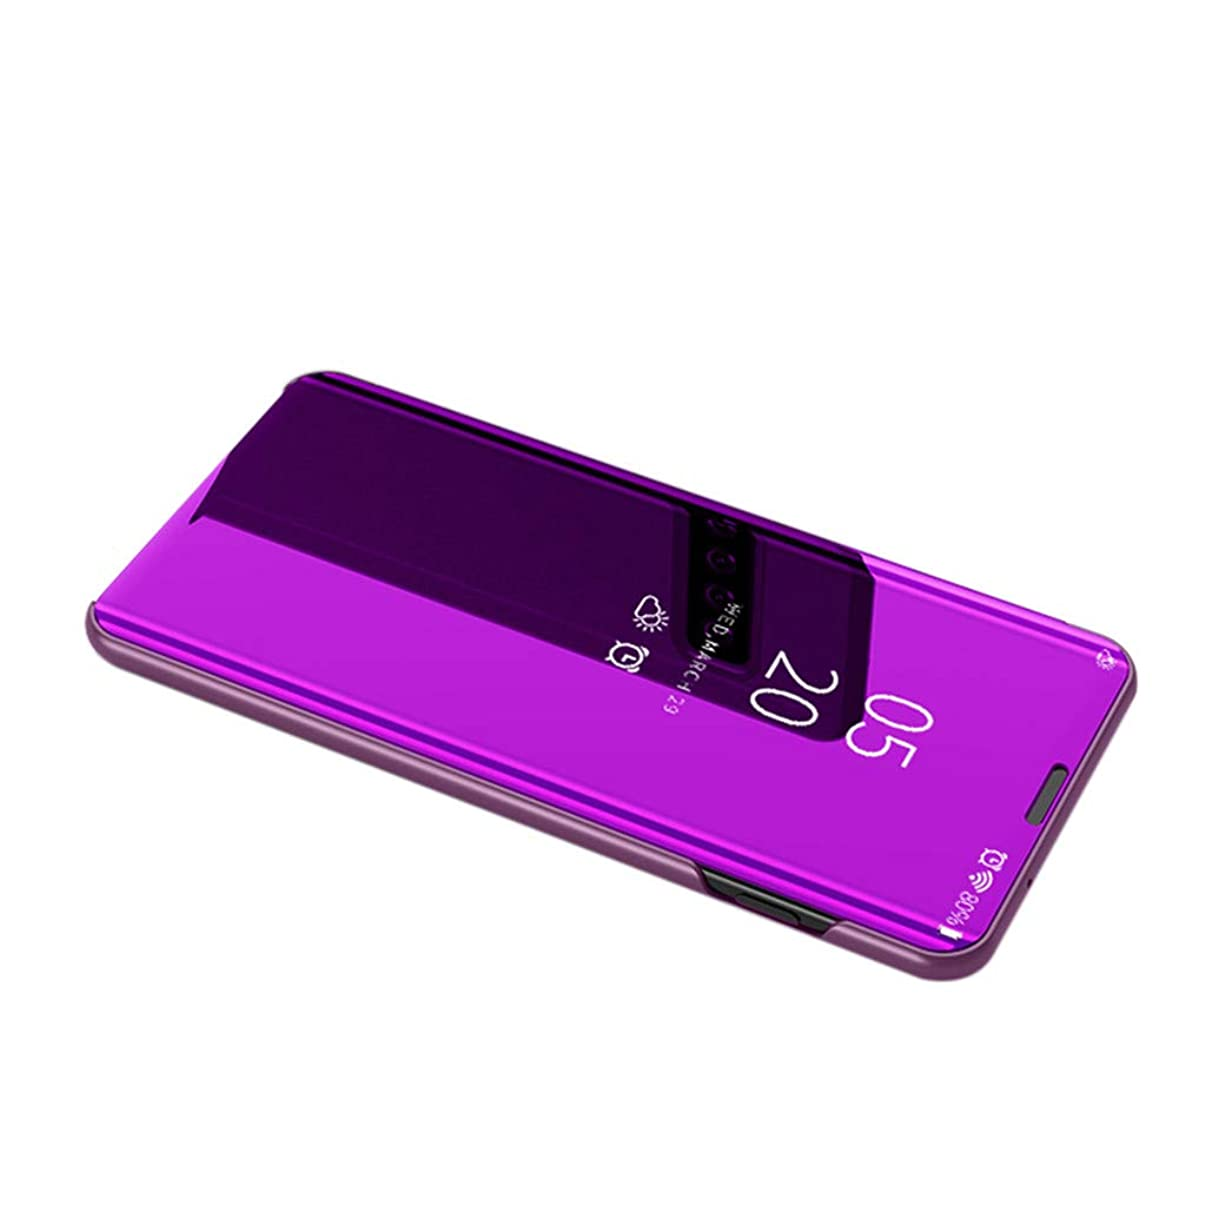 Ecurson Phone Case Cover,Mirror Plating Sleep Wake Flip Leather Case Cover for Samsung Galaxy S10E